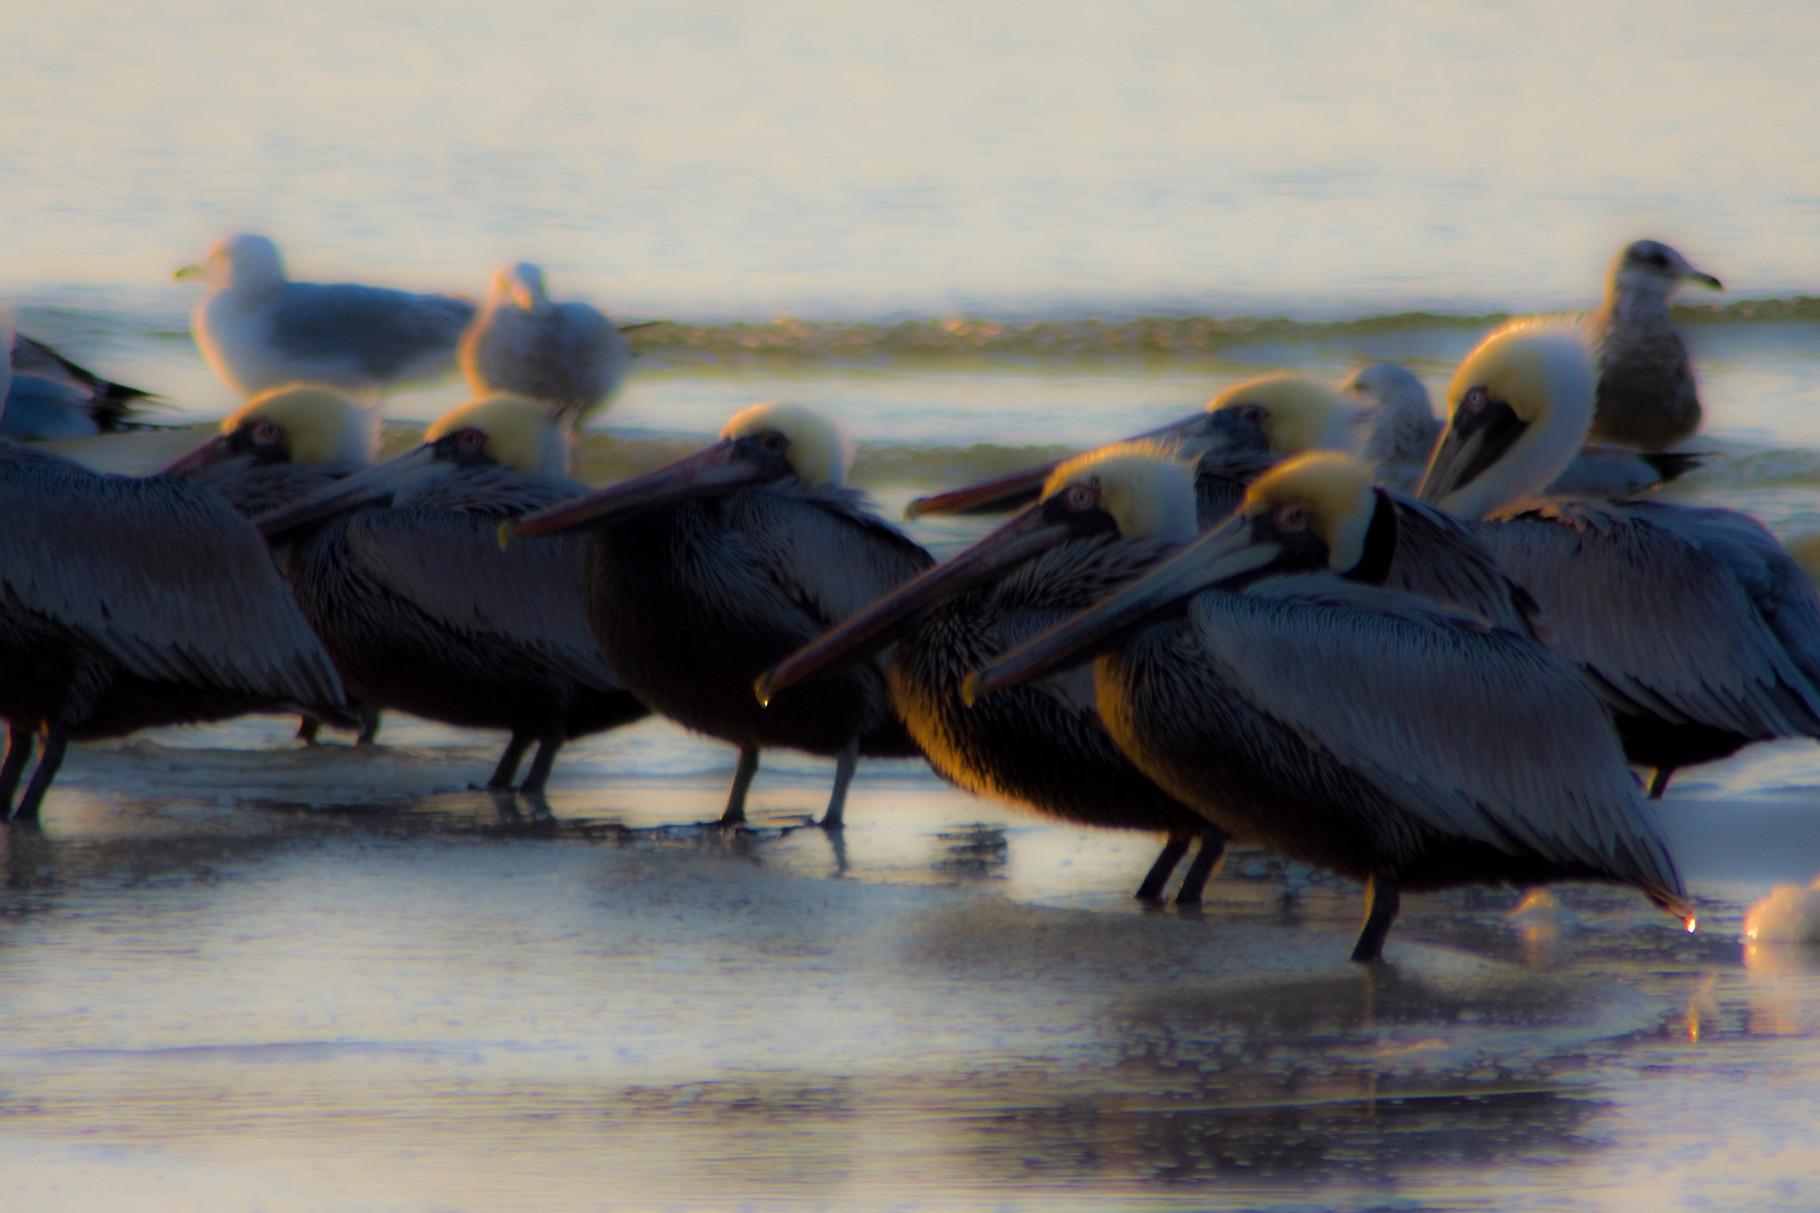 08_Pelikane (pelicans) in Fort Walton Beach in Florida